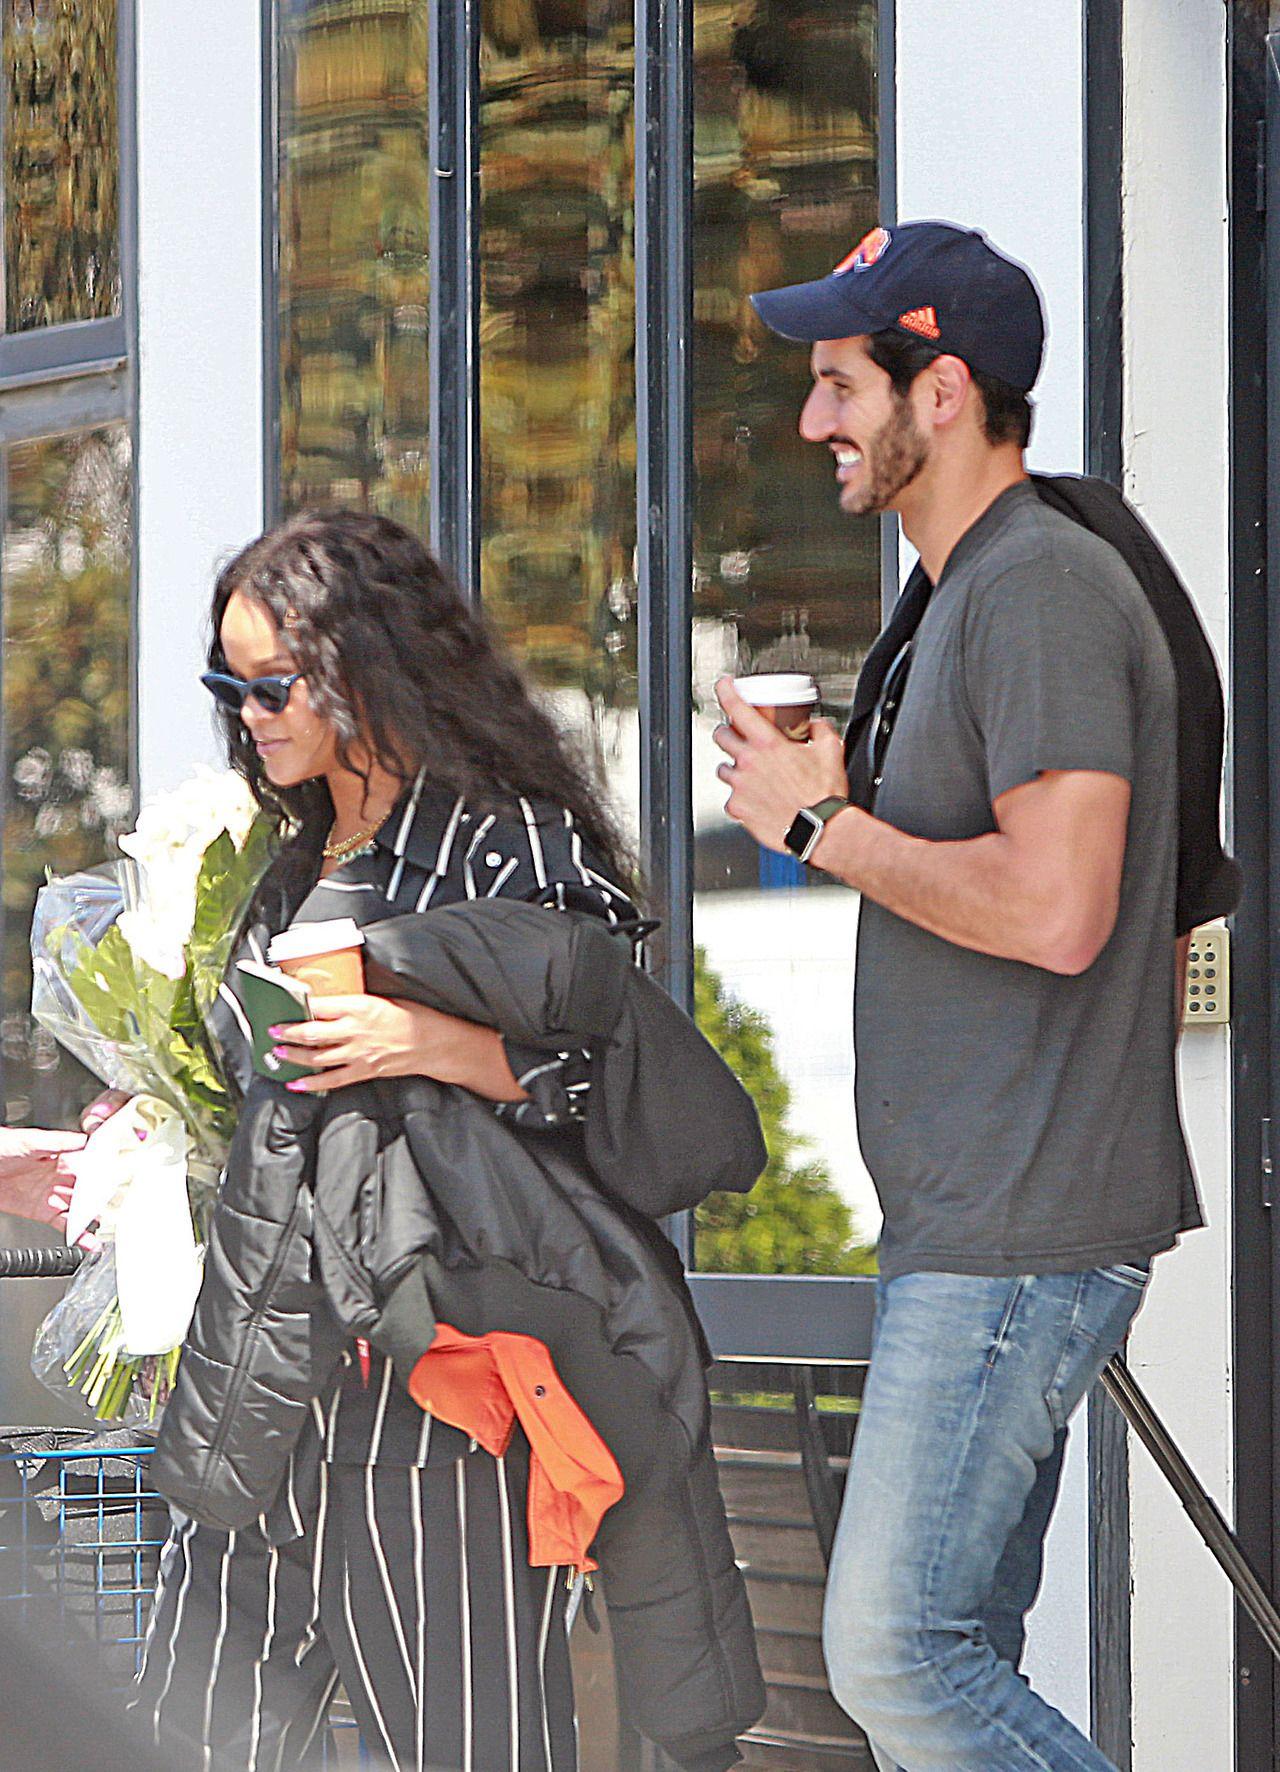 Rihanna caught hot kisses with an Arab millionaire